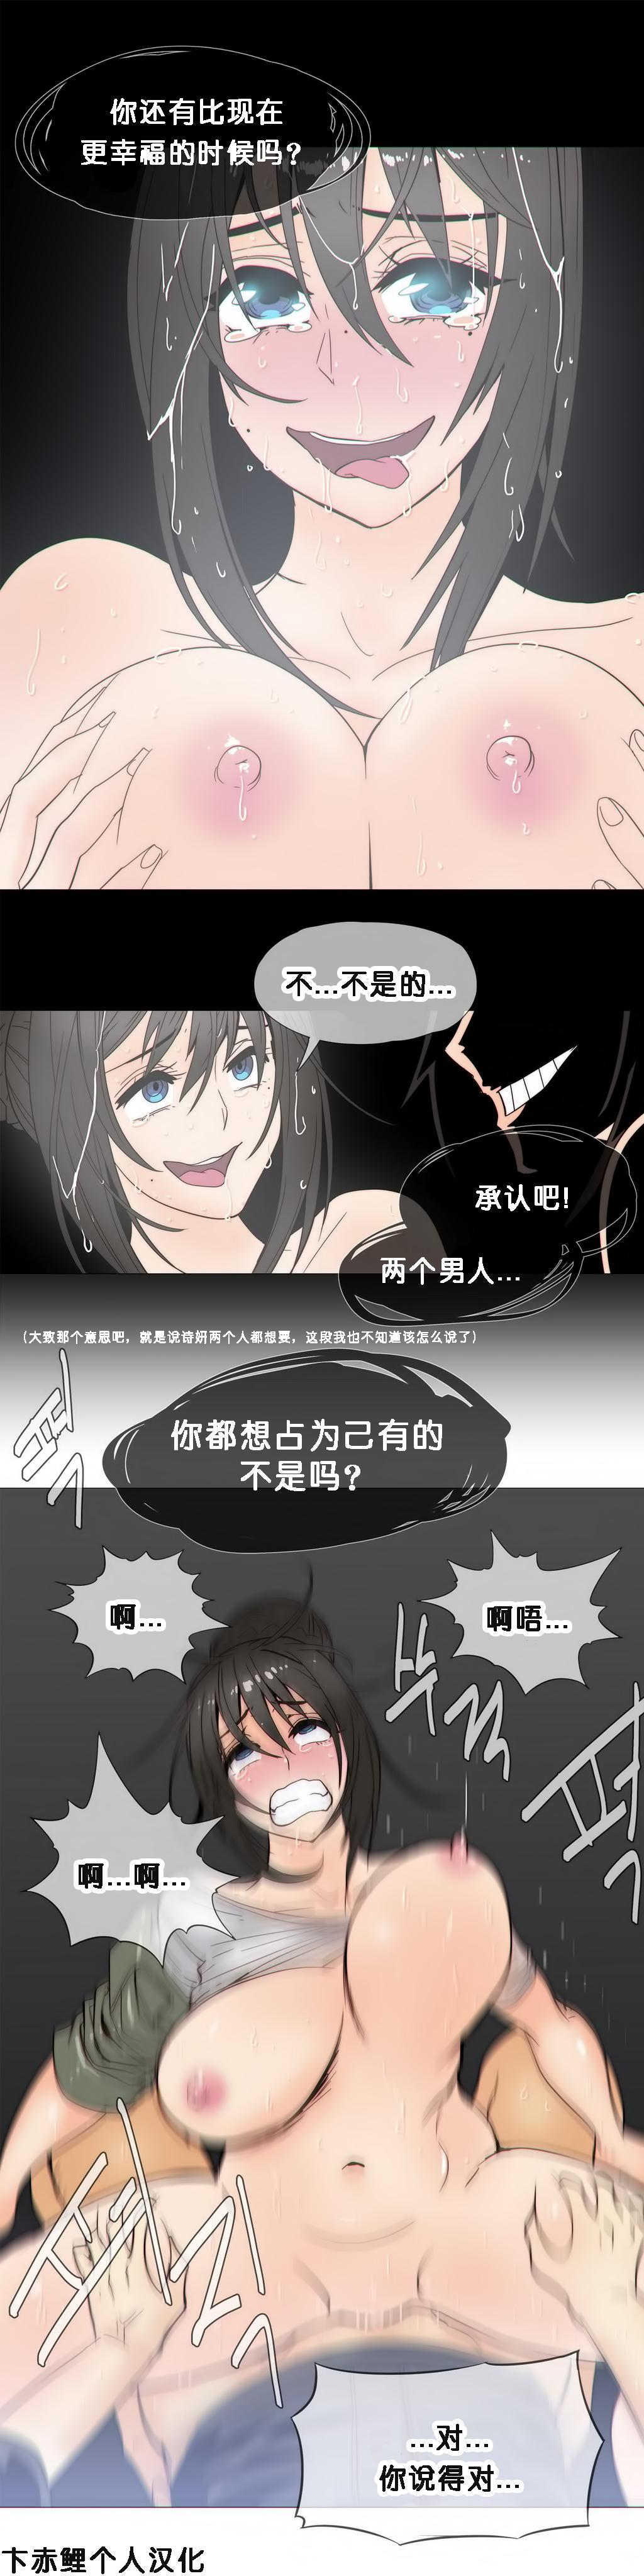 HouseHold Affairs 【卞赤鲤个人汉化】1~21话(持续更新中) 486